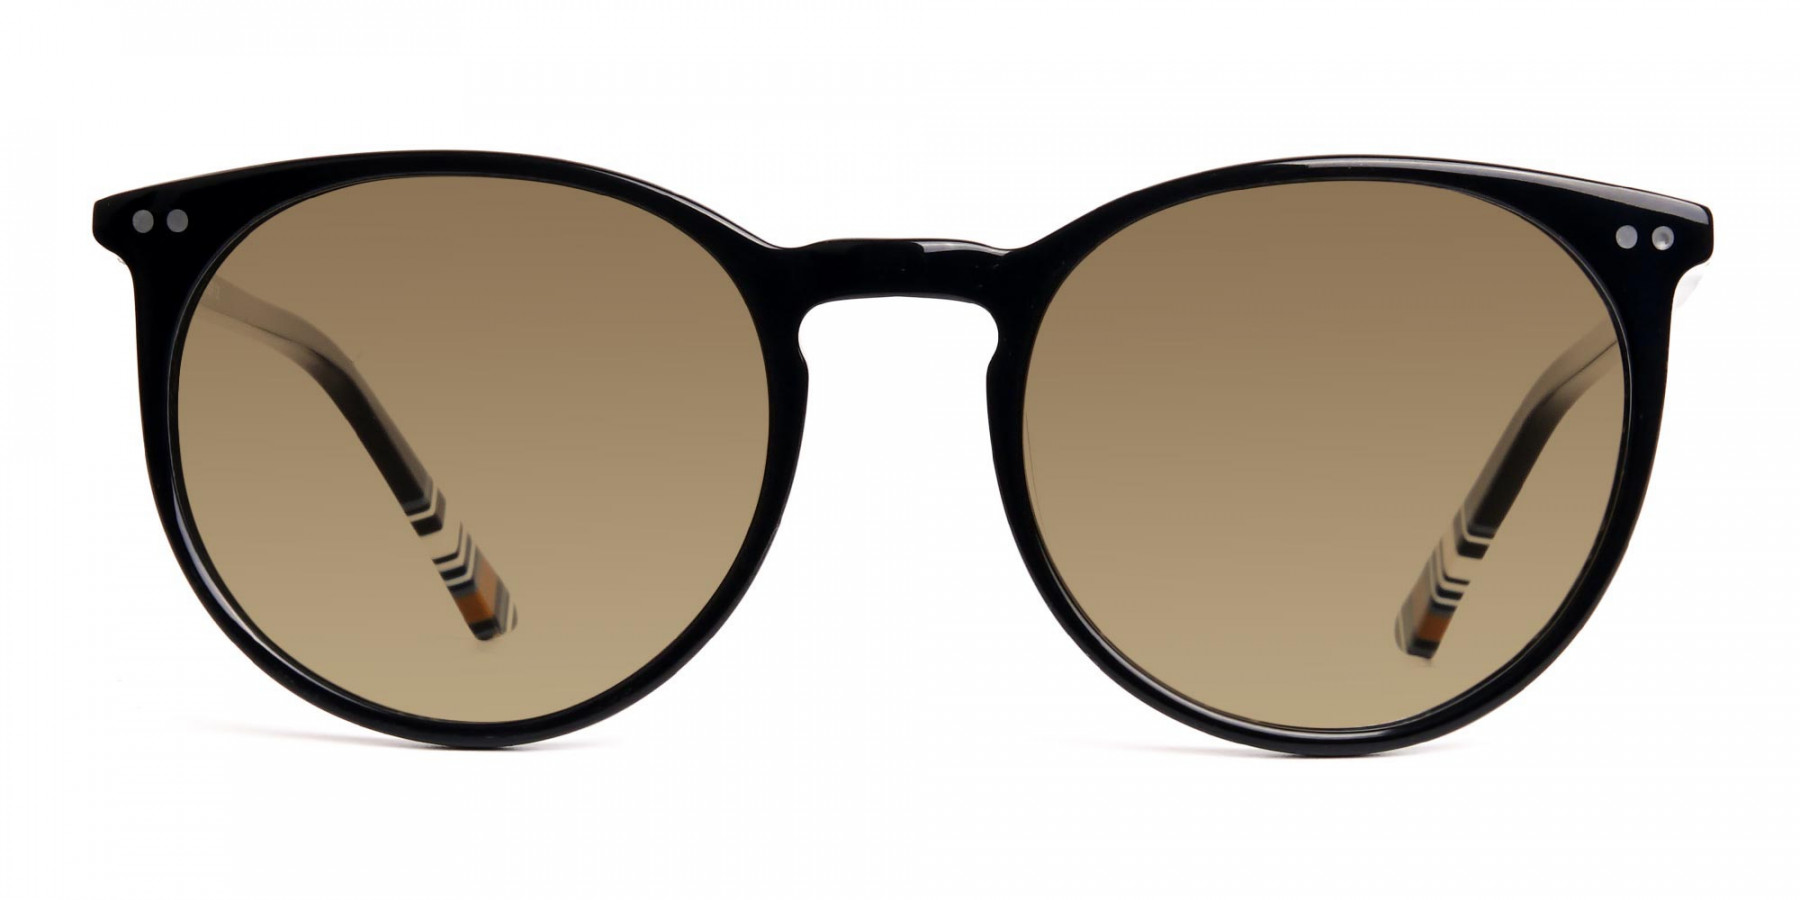 black-round-designer-brown-tinted-sunglasses-frames-3